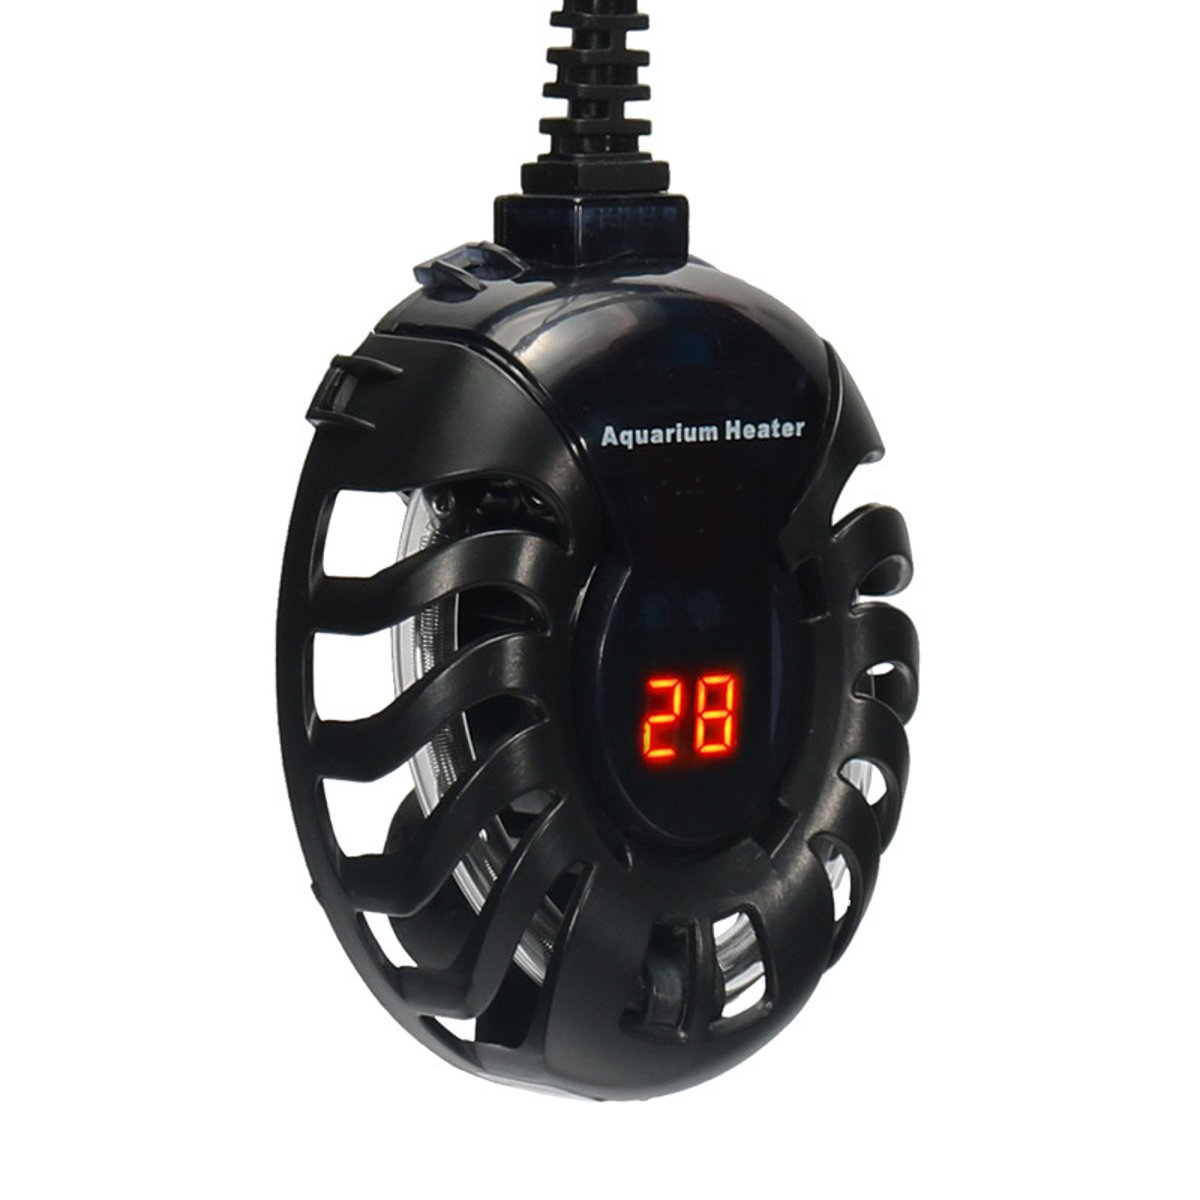 Mini Aquarium Fish Tank LED Digital Heater Submersible Adjustable Thermostat